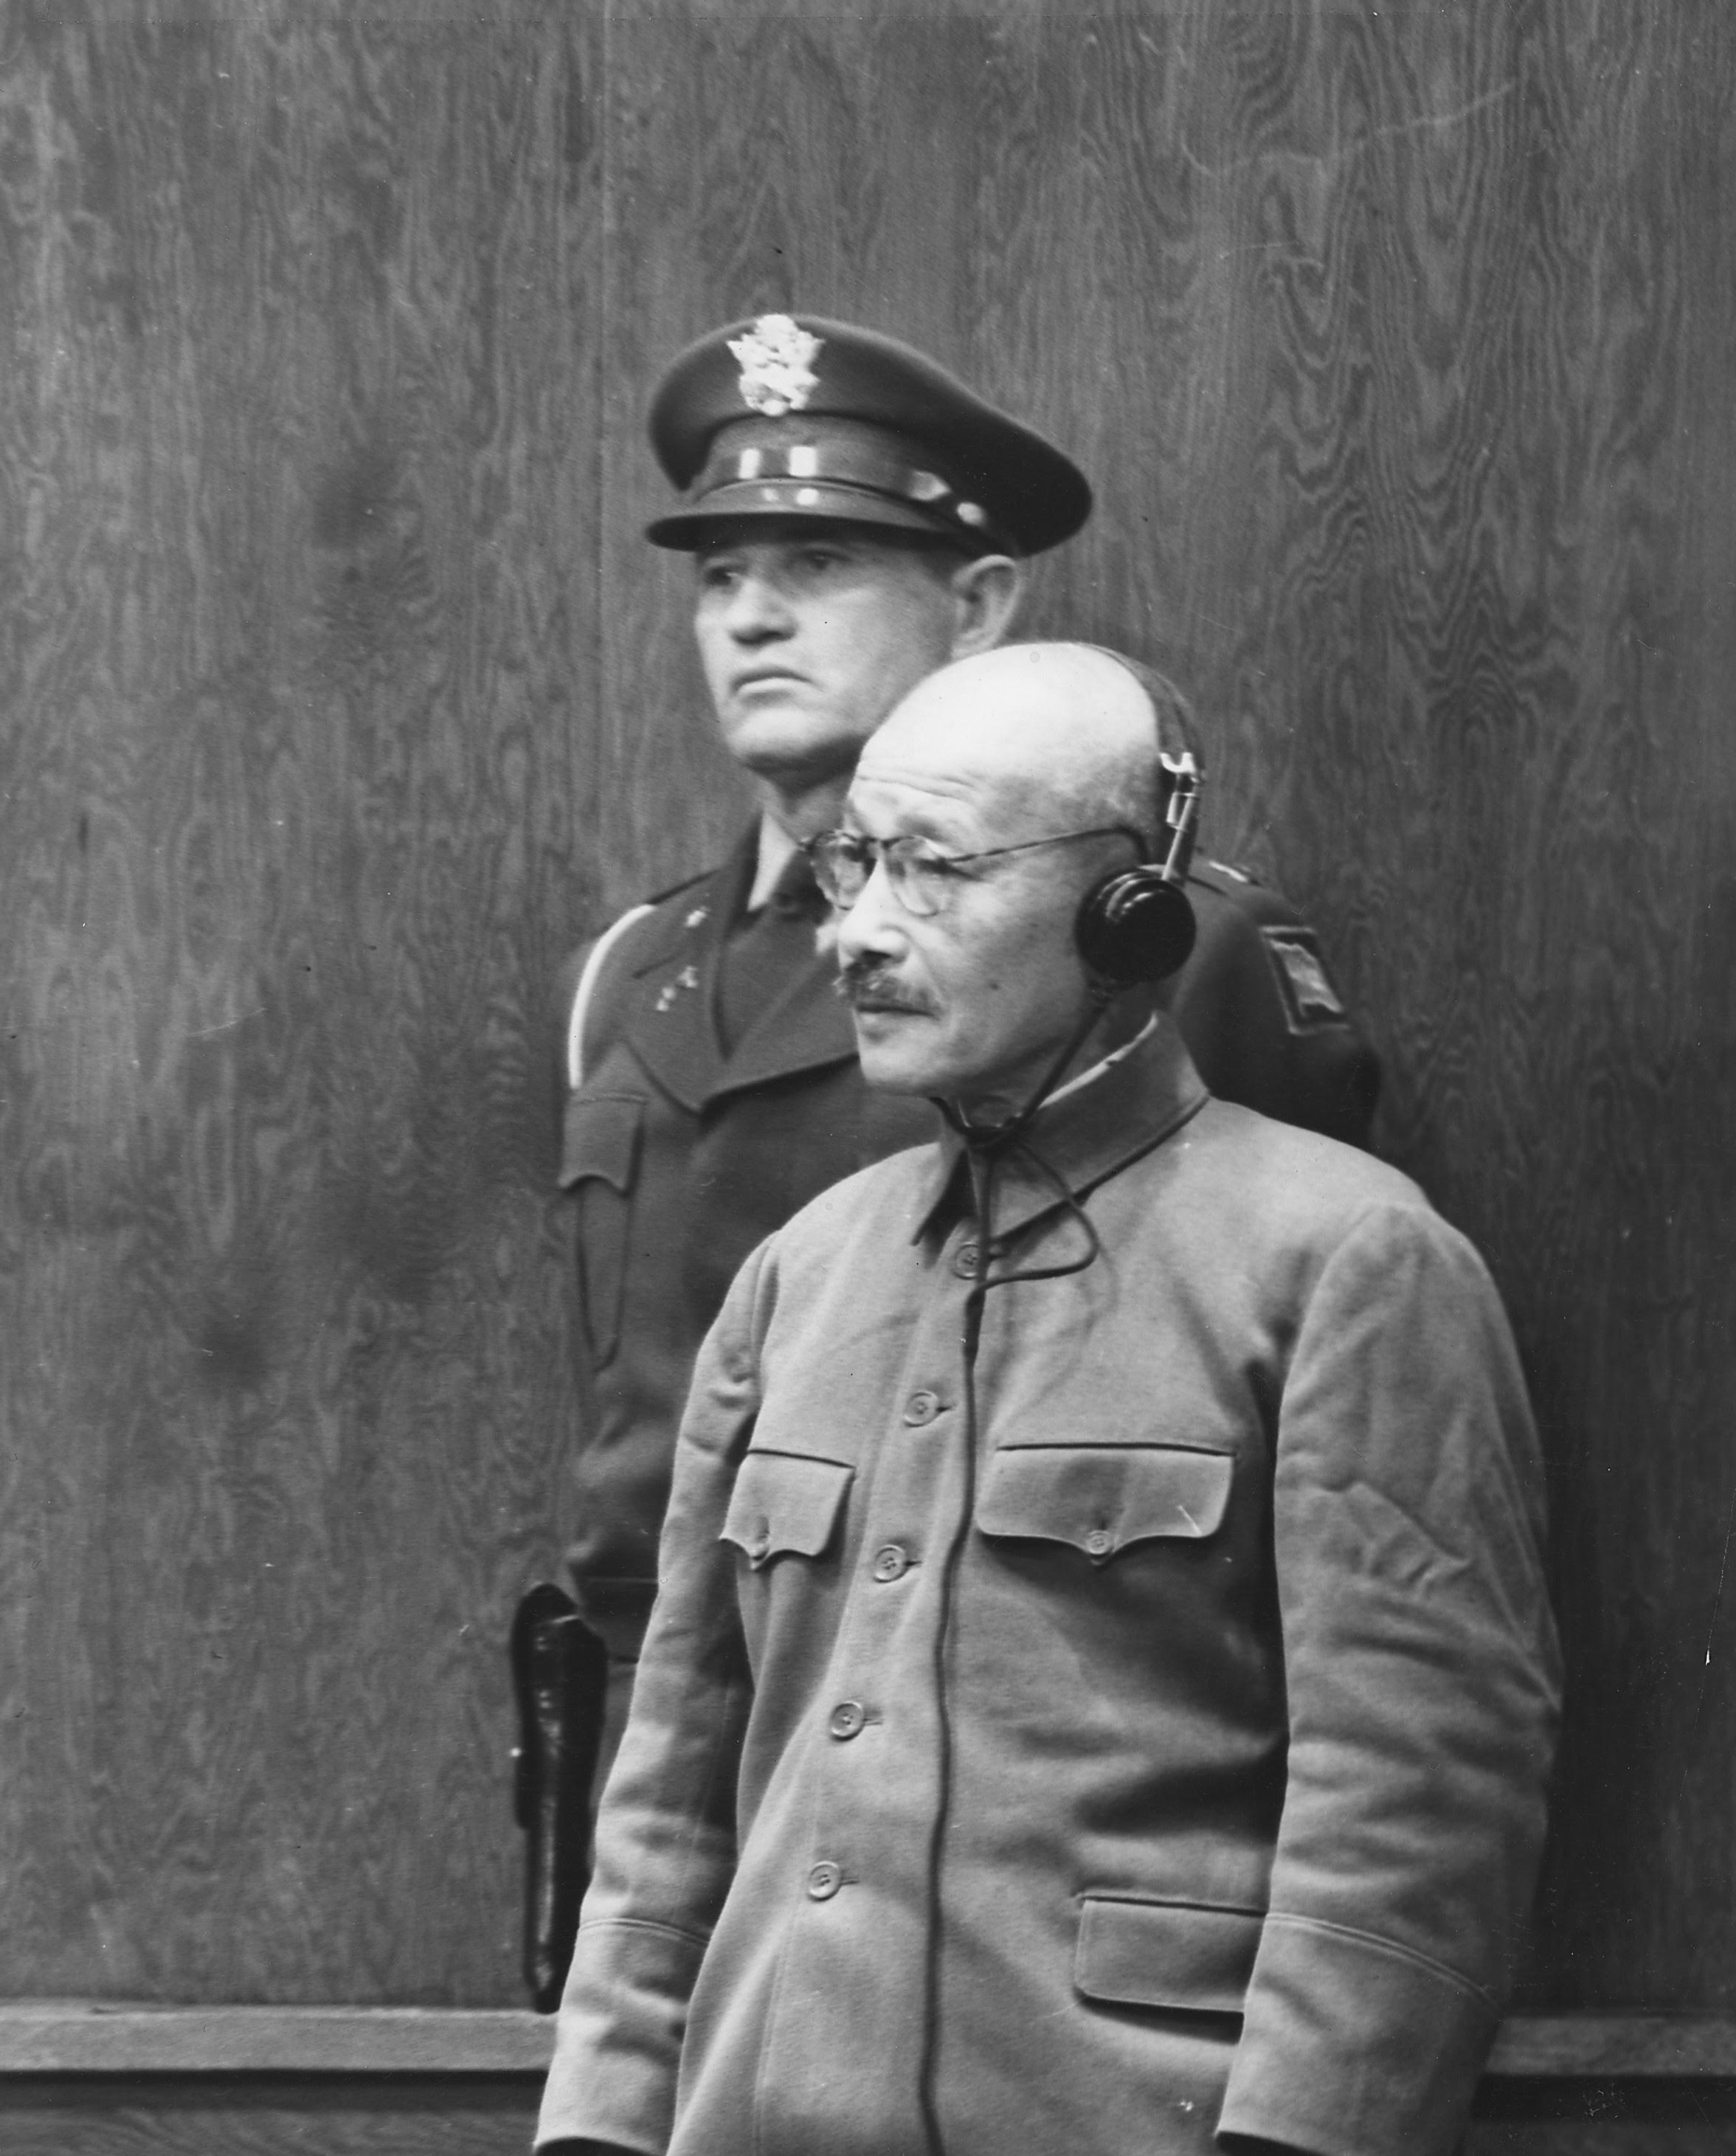 Hideki Tojo receiving his death sentence, Tokyo, Japan, 12 Nov 1948